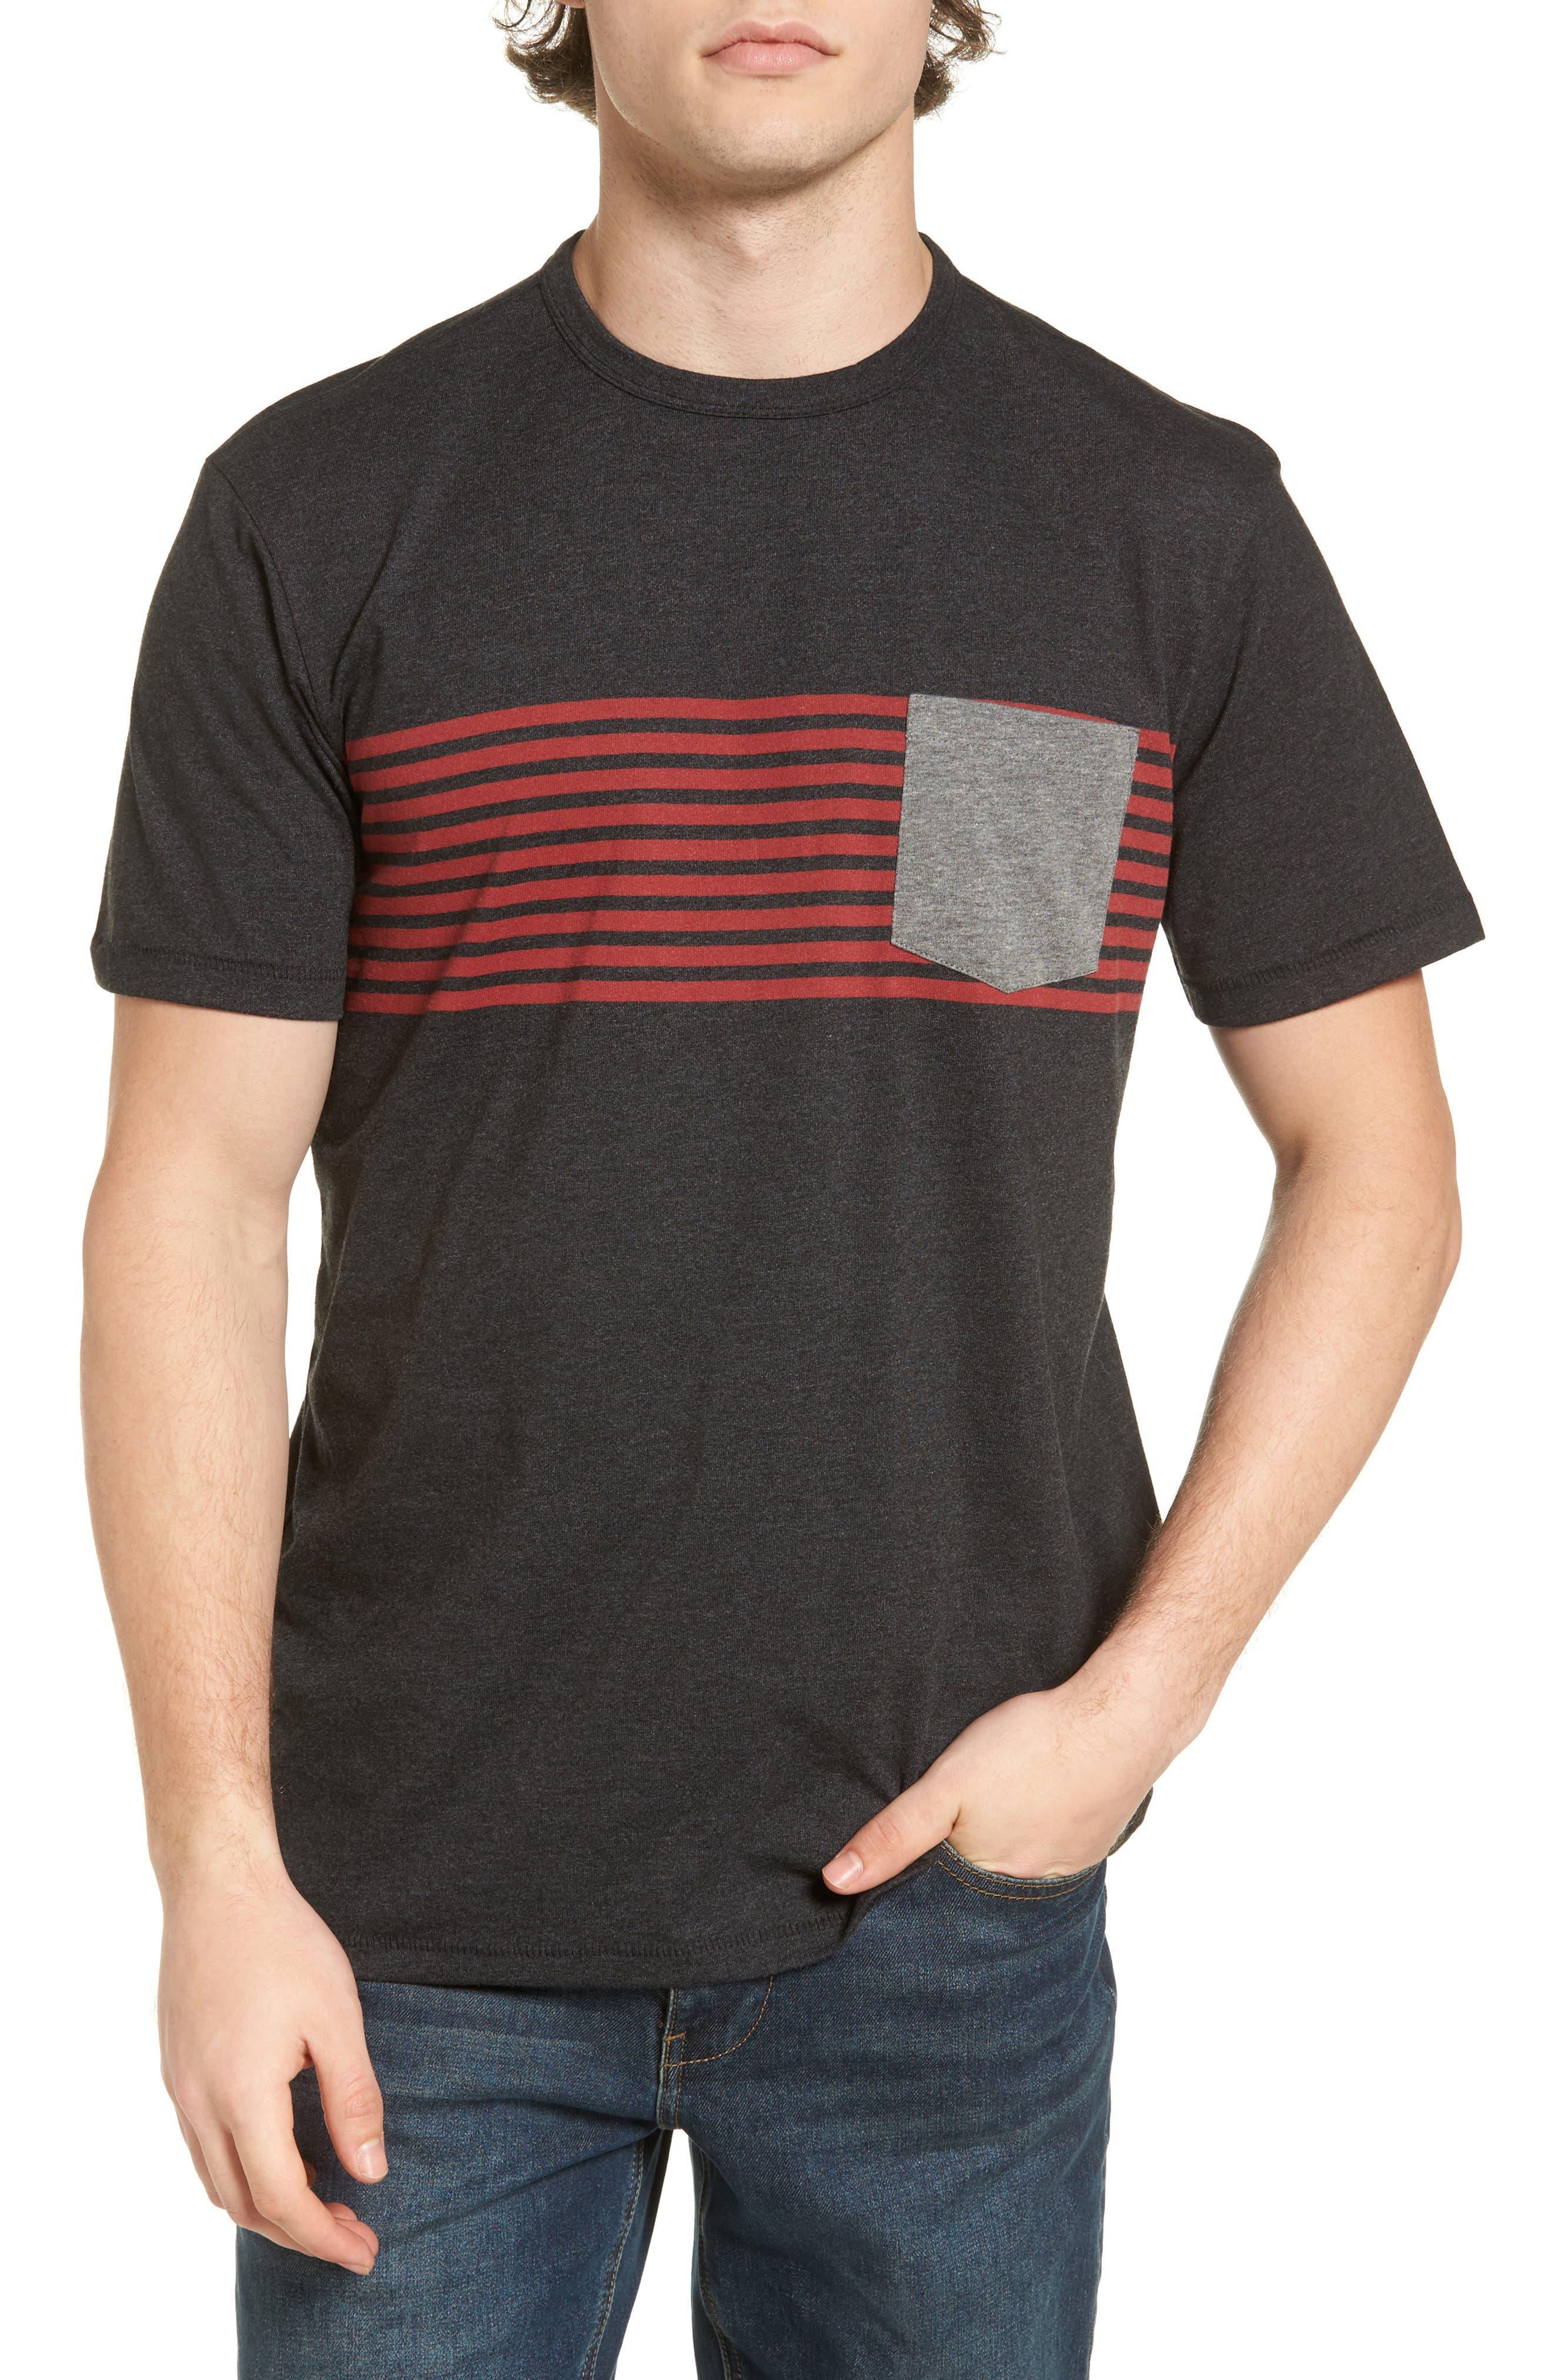 O'Neill Rodgers Striped Pocket T-Shirt